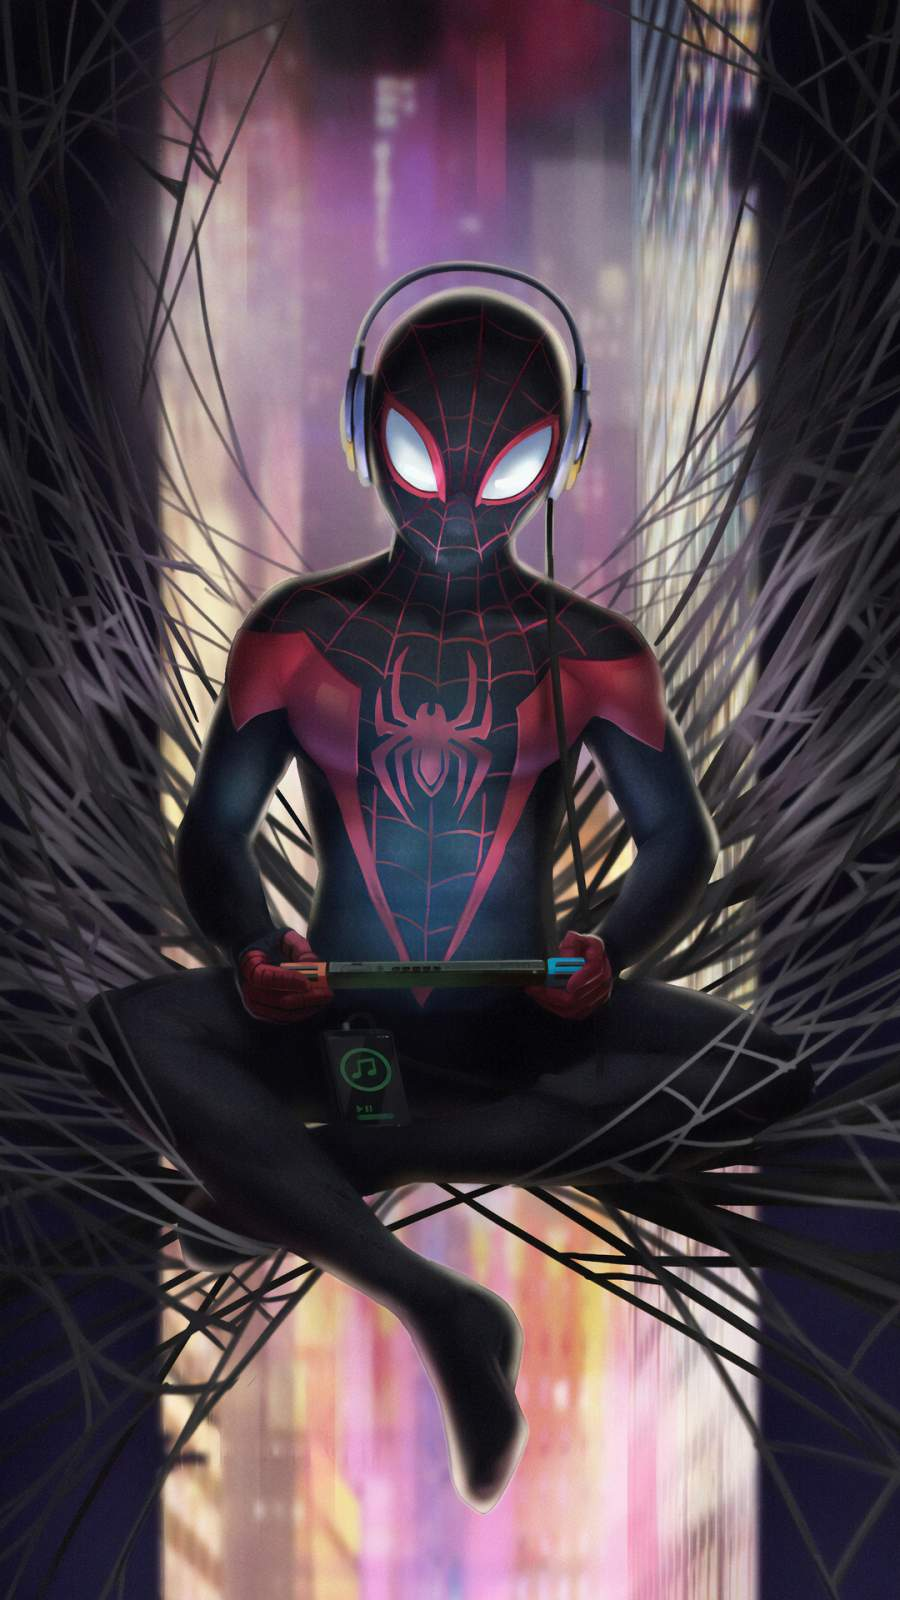 Spiderman Listening Music iPhone Wallpaper